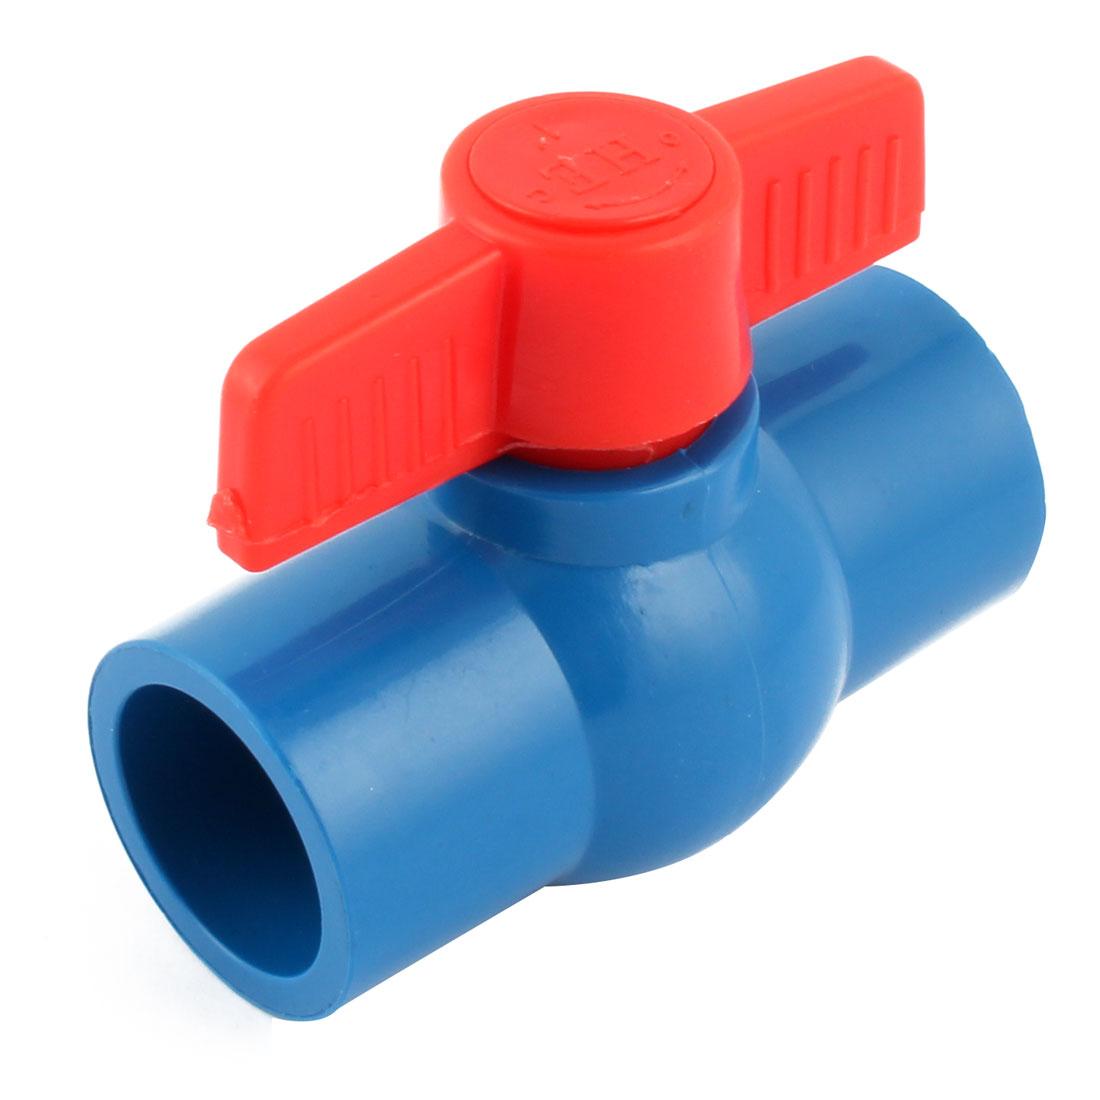 U-PVC No-thread Nonslip Full Port Ball Valve Blue Red 1 Inch Inner Dia